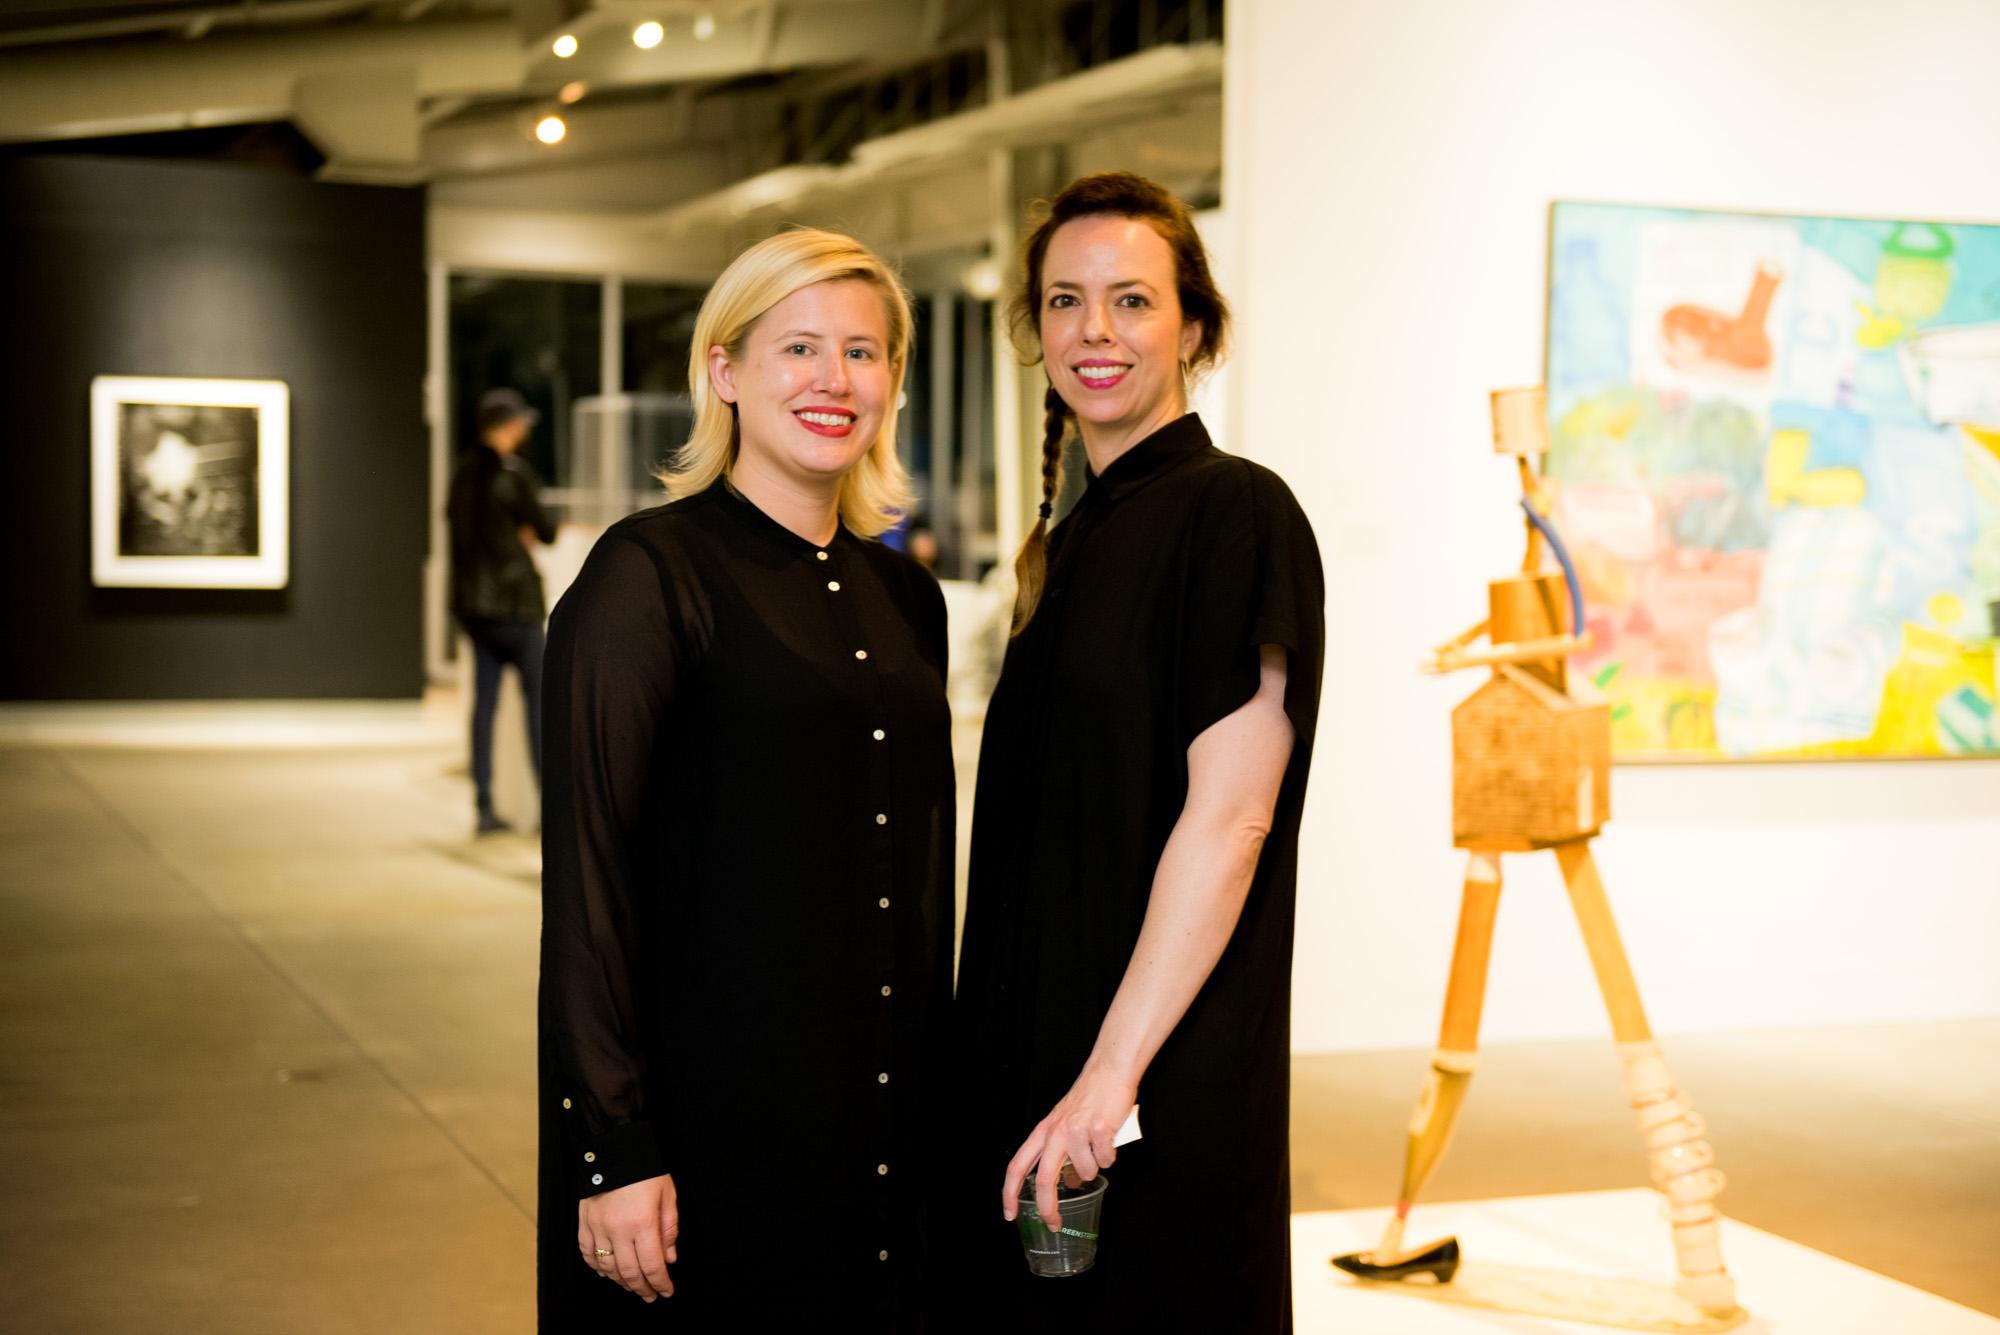 Kara Q. Smith and Amy Owen